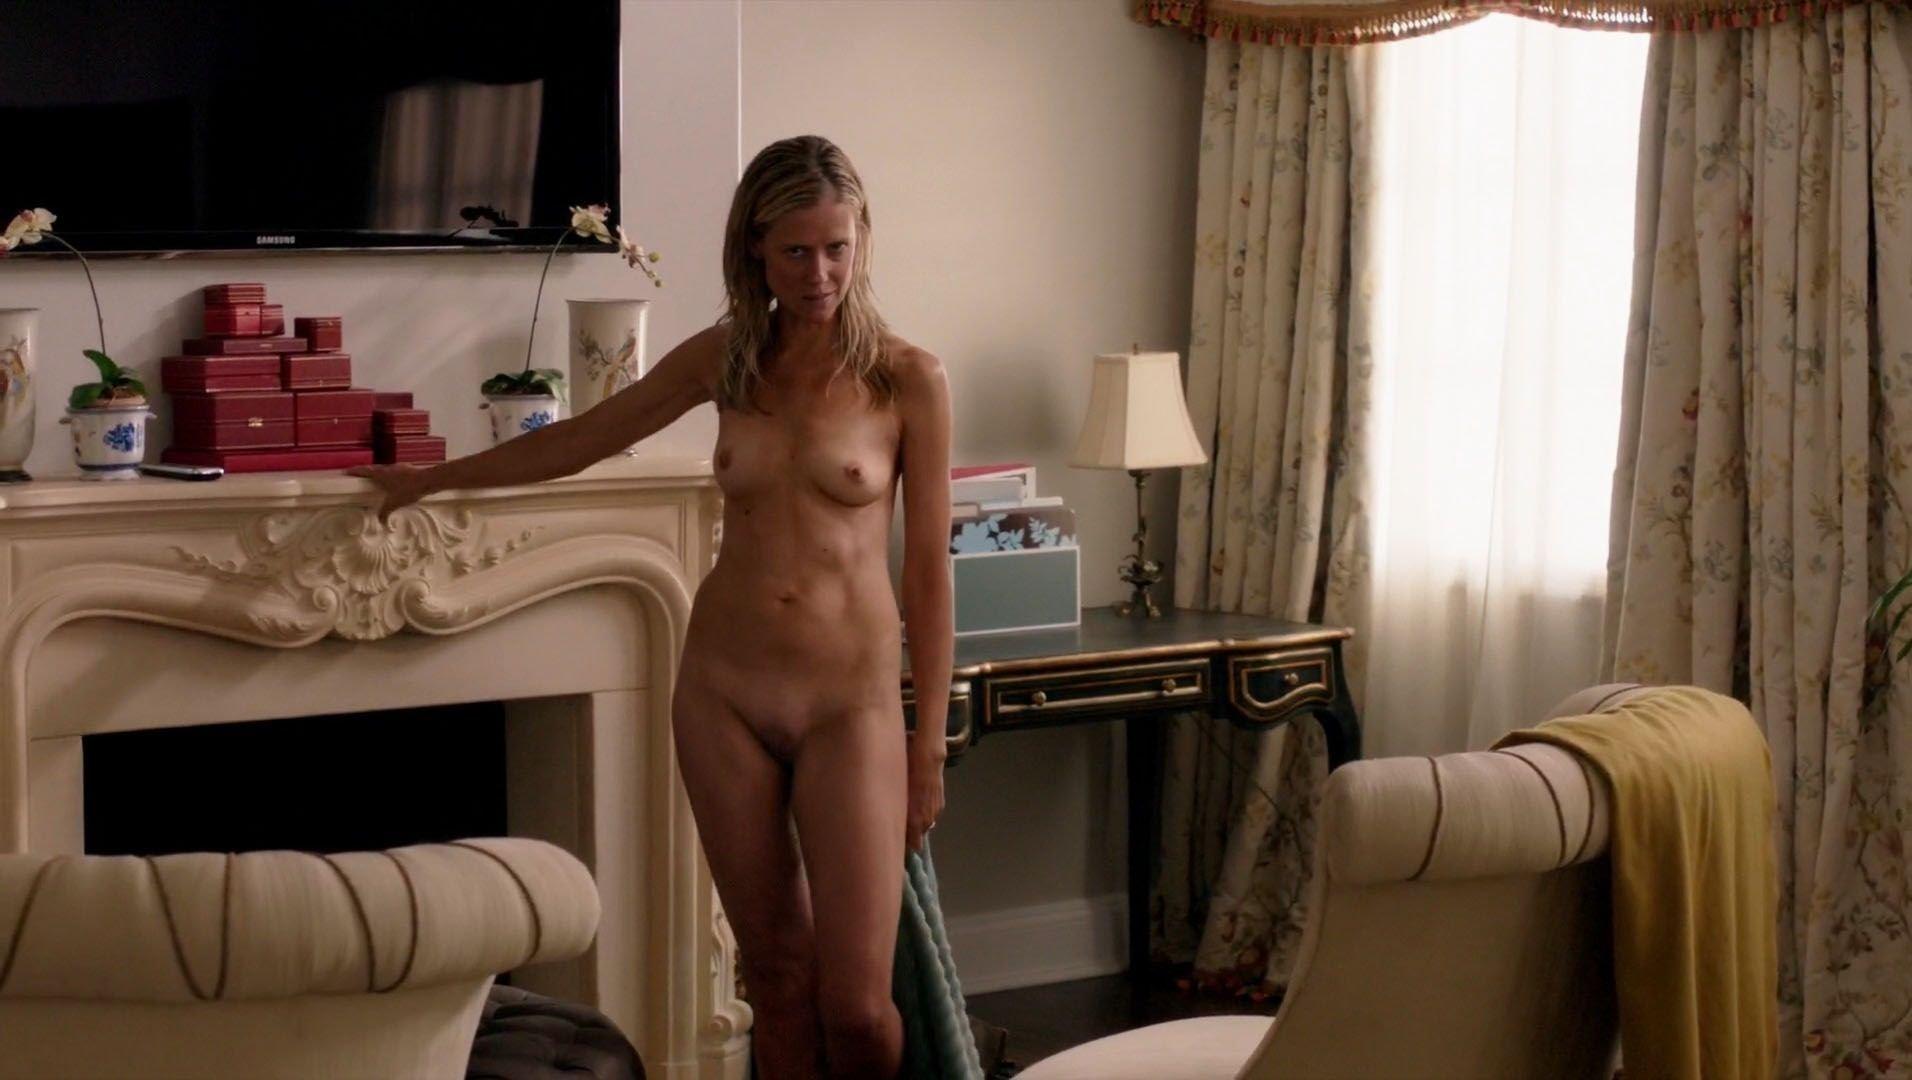 Kelly deadmon nude